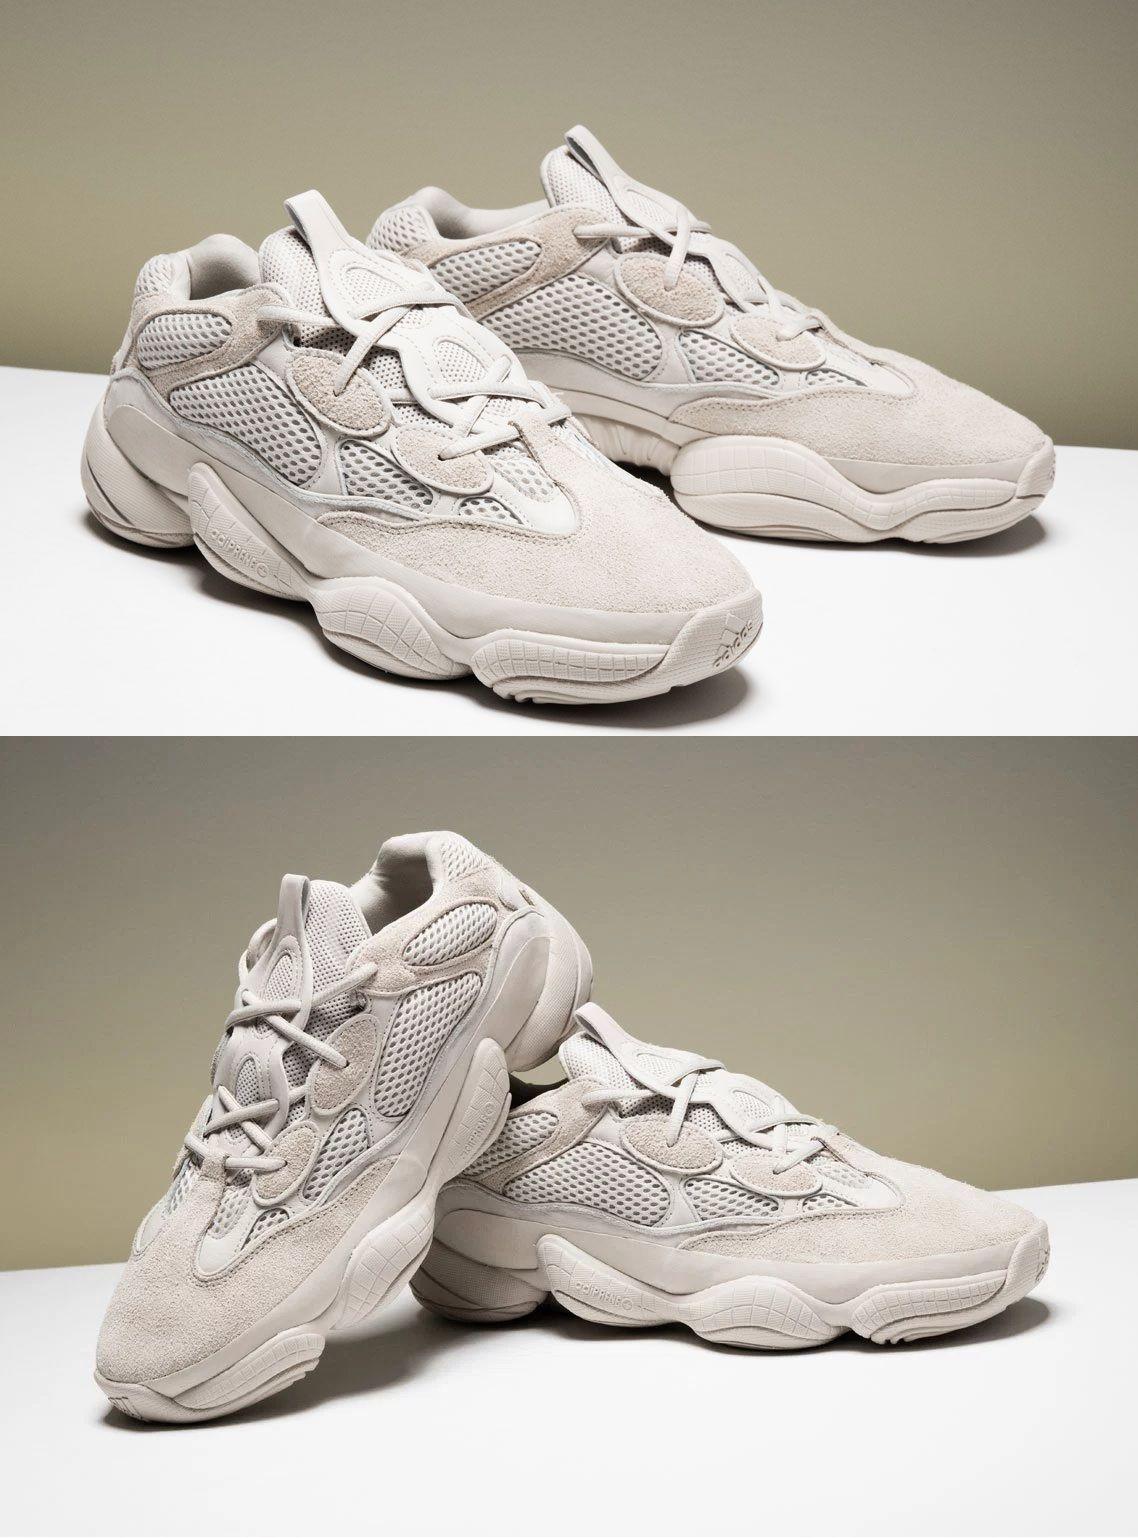 Yeezy En 500Sneakers En Yeezy 2019 Adidas Adidas Yeezy Adidas 2019 500Sneakers XTPkZuOi